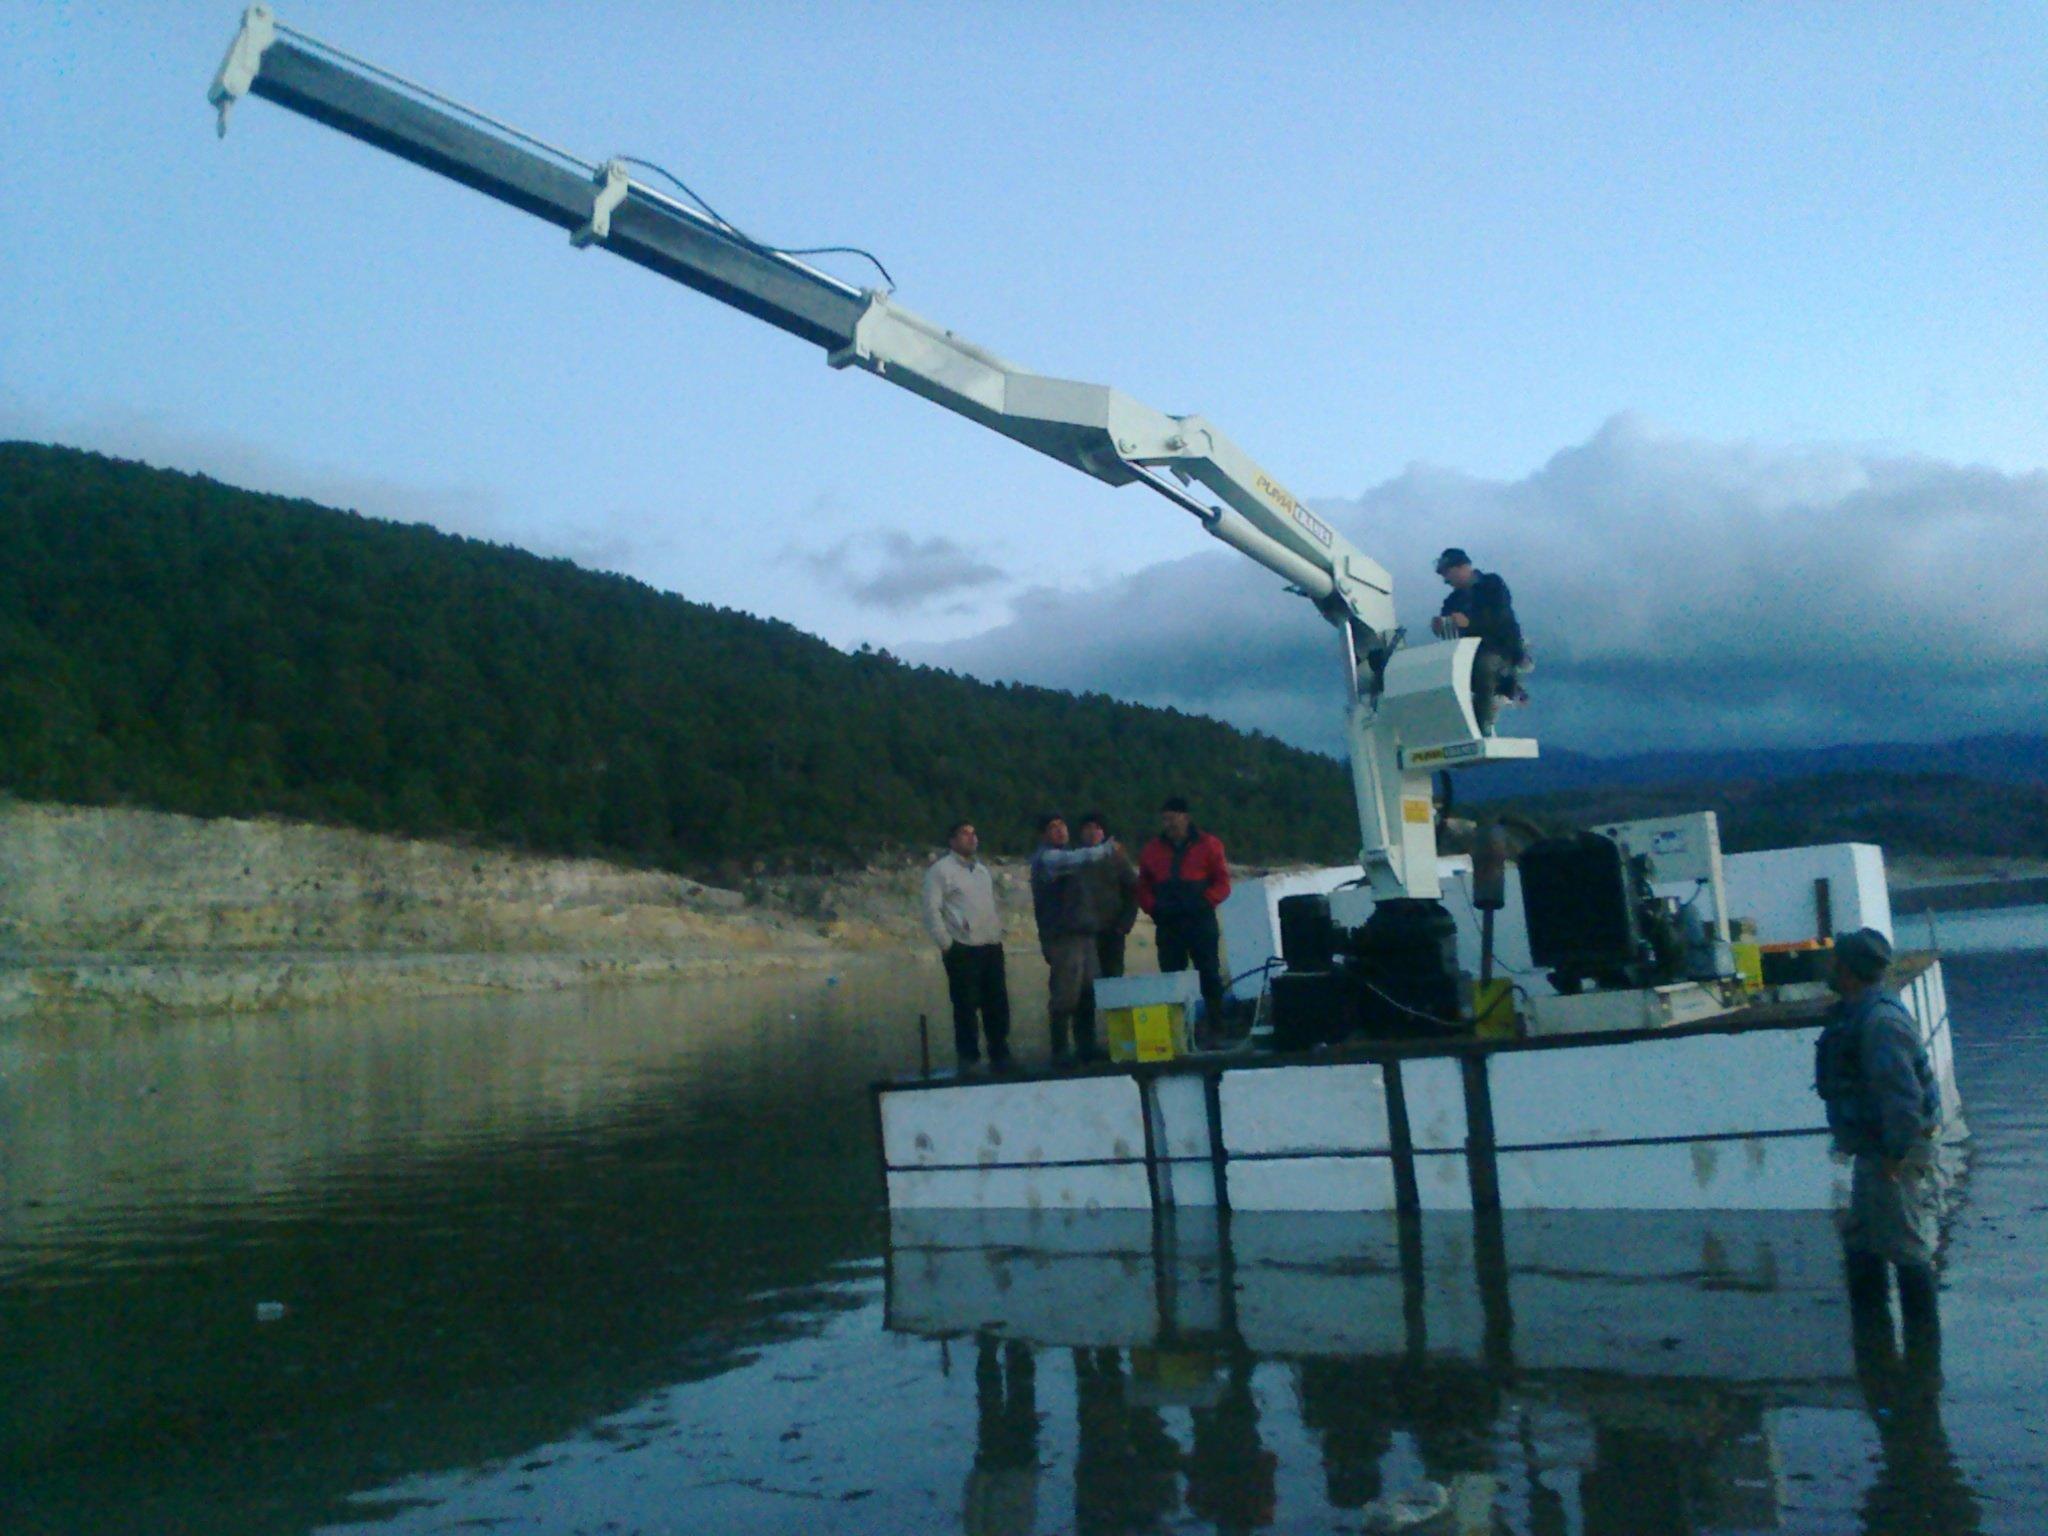 puma-marine-crane72880.jpg